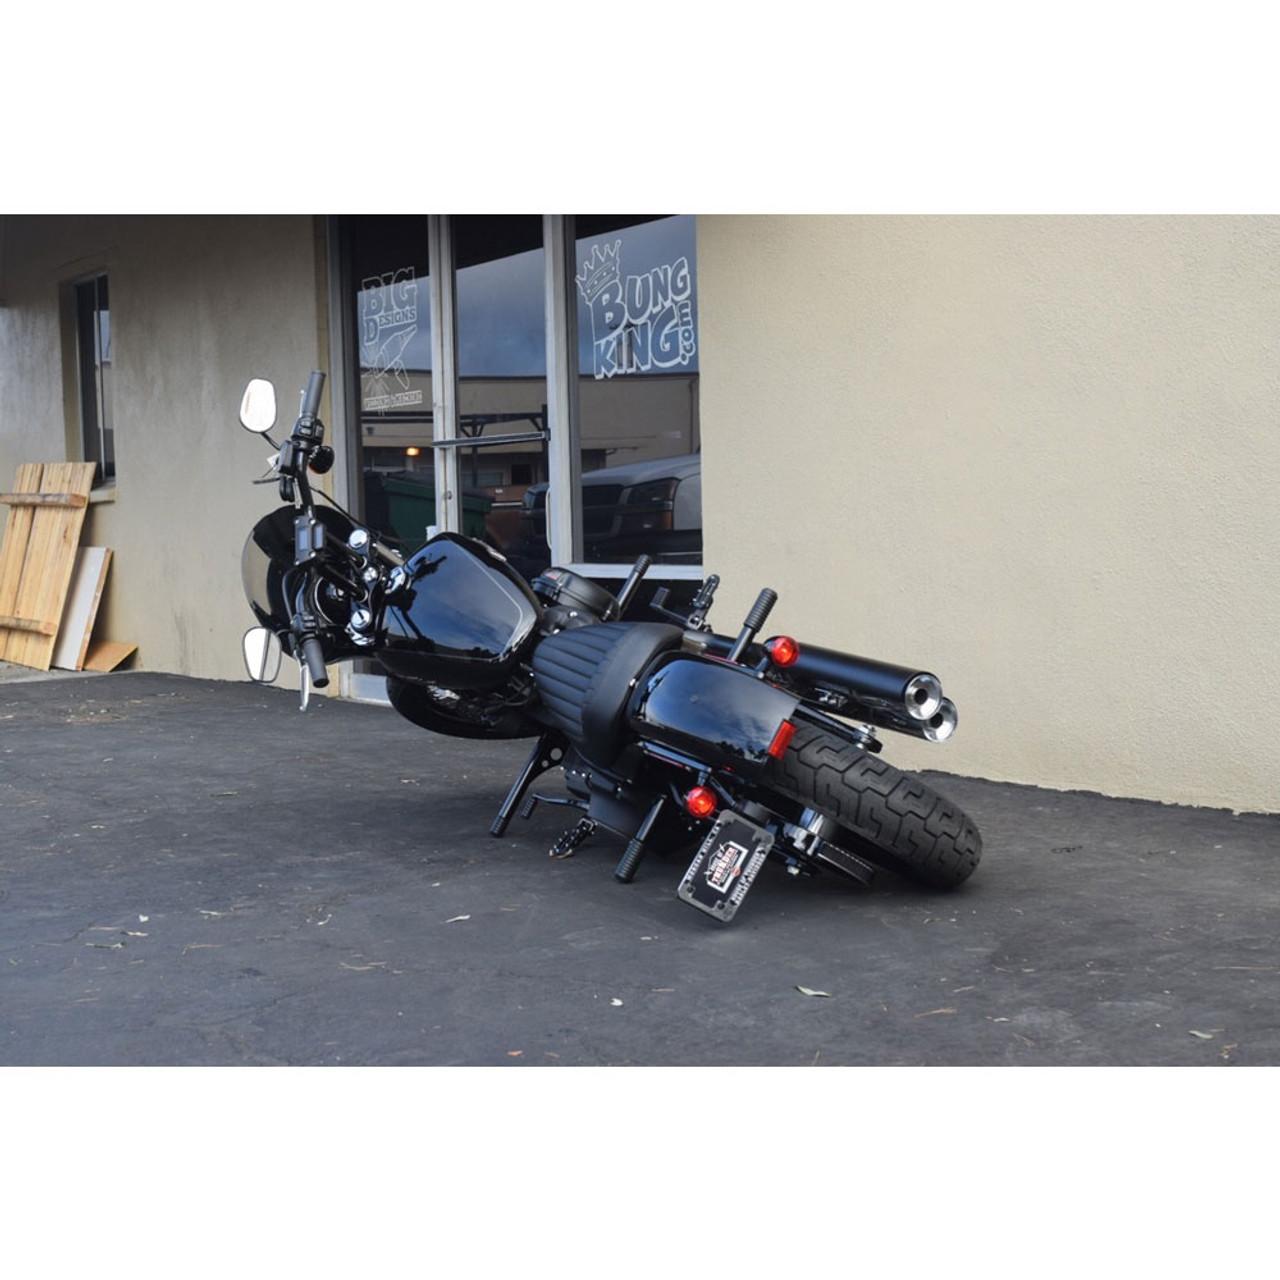 Bung King Highway Peg Crash Bar For 2018 Harley Softail